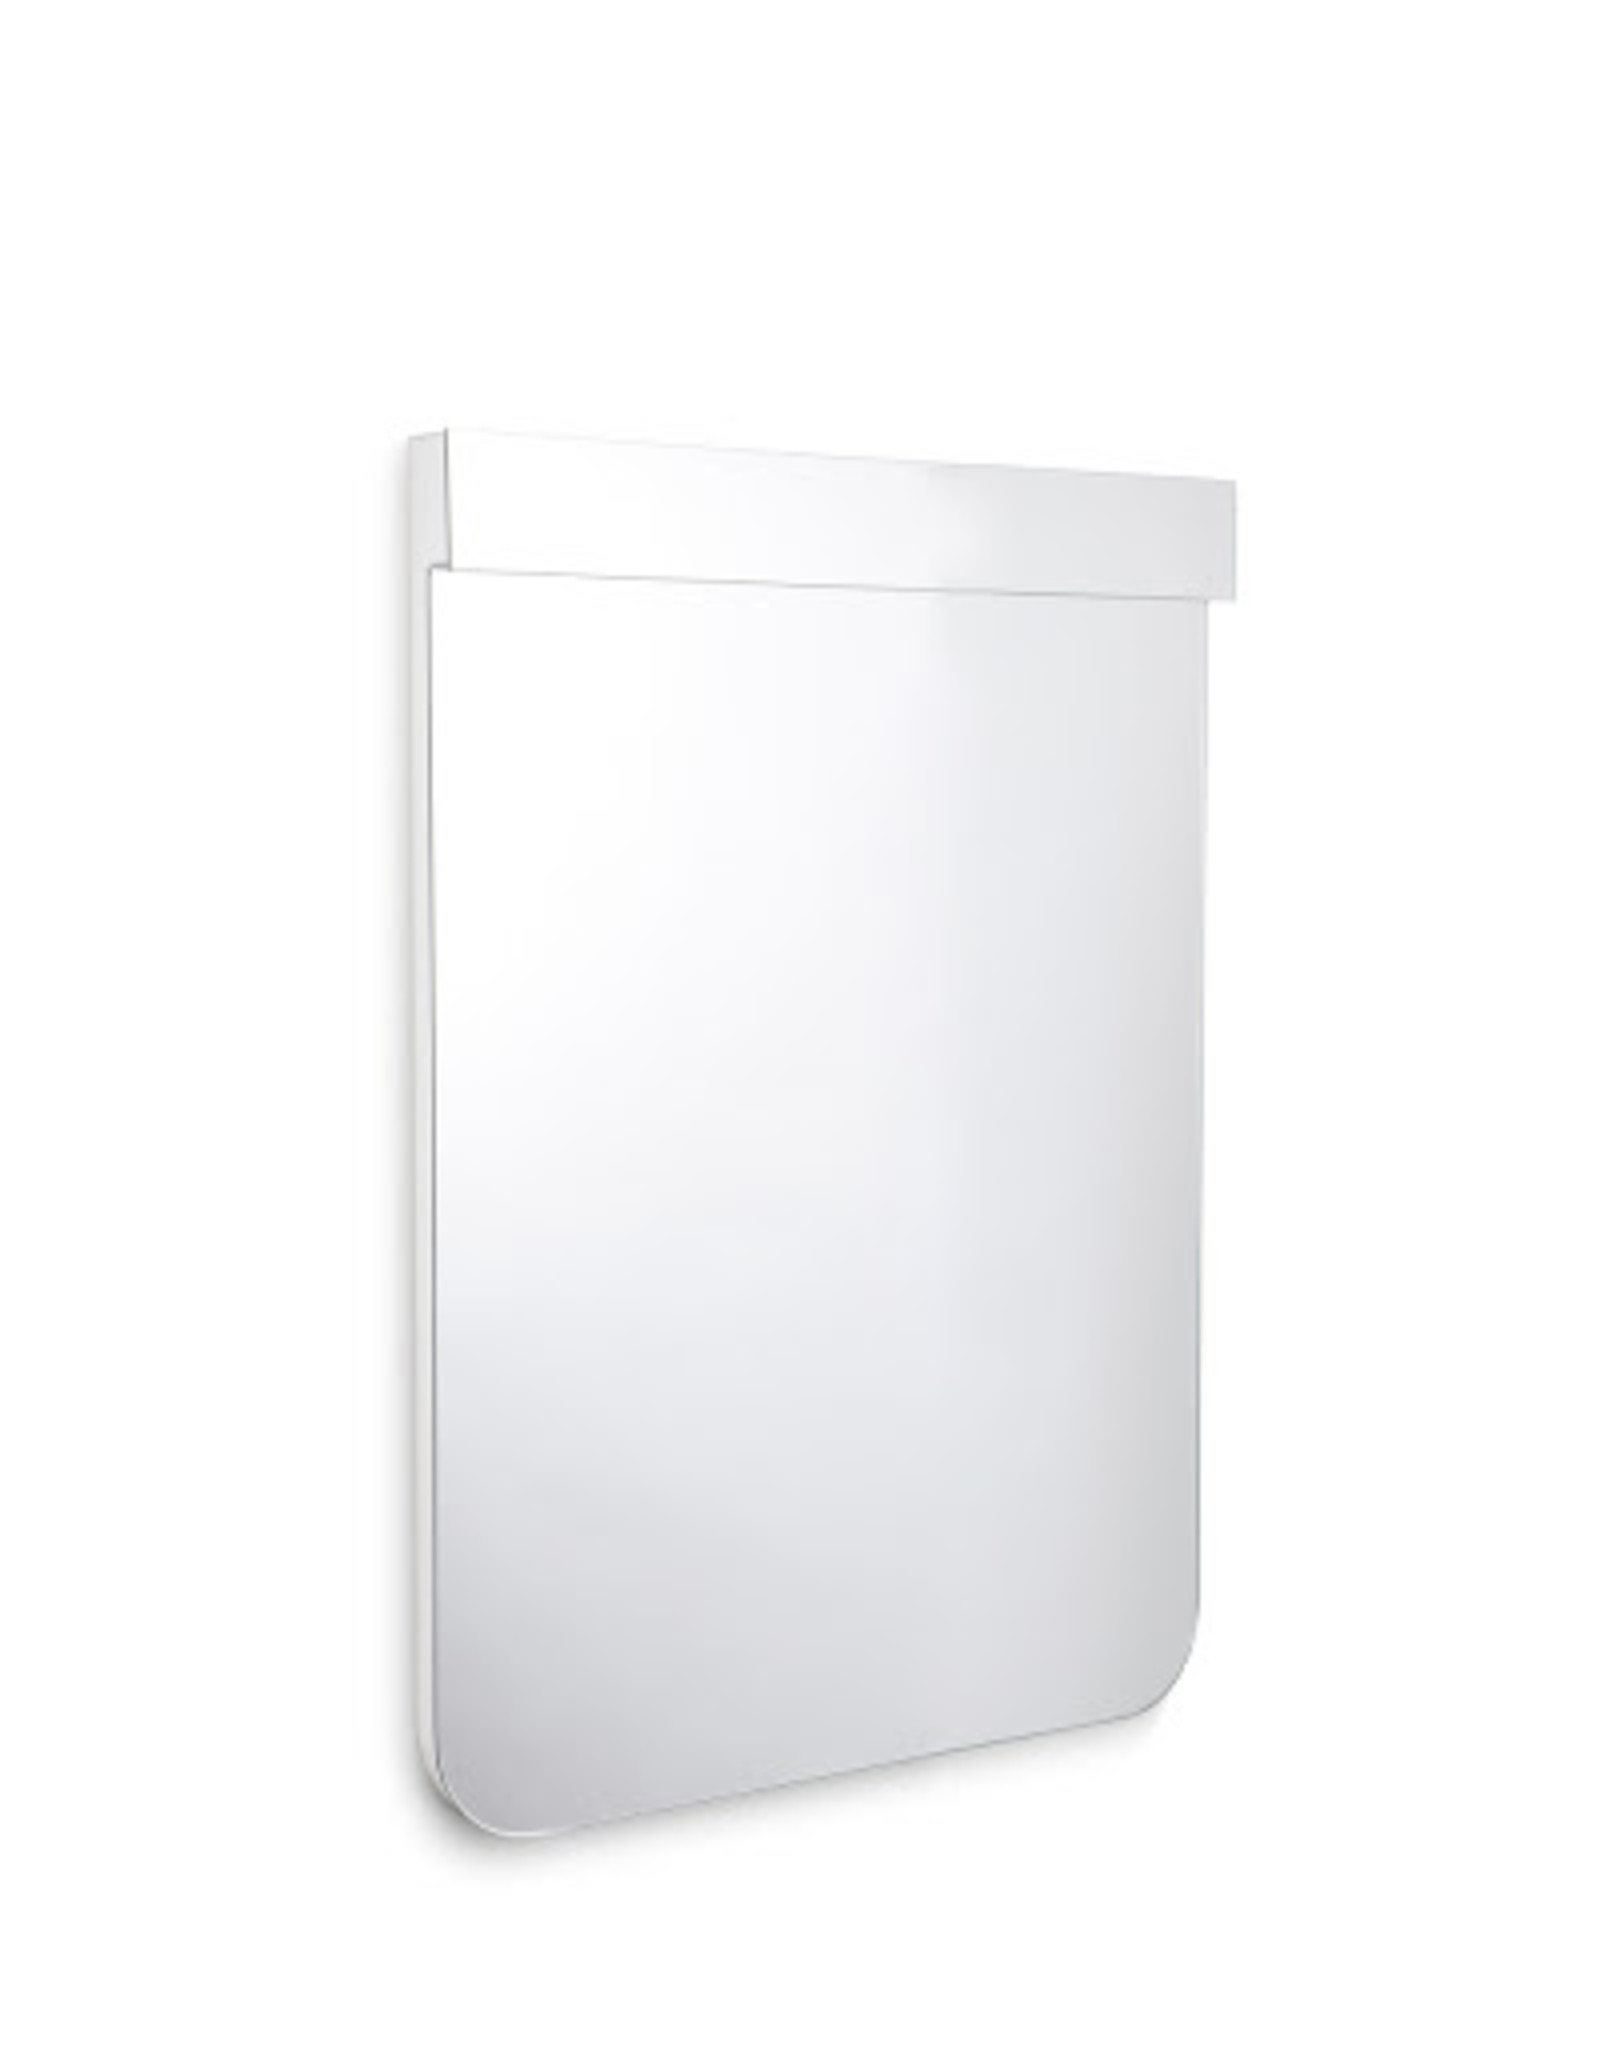 Scalin miroir avec armature blanche 90cm - vente